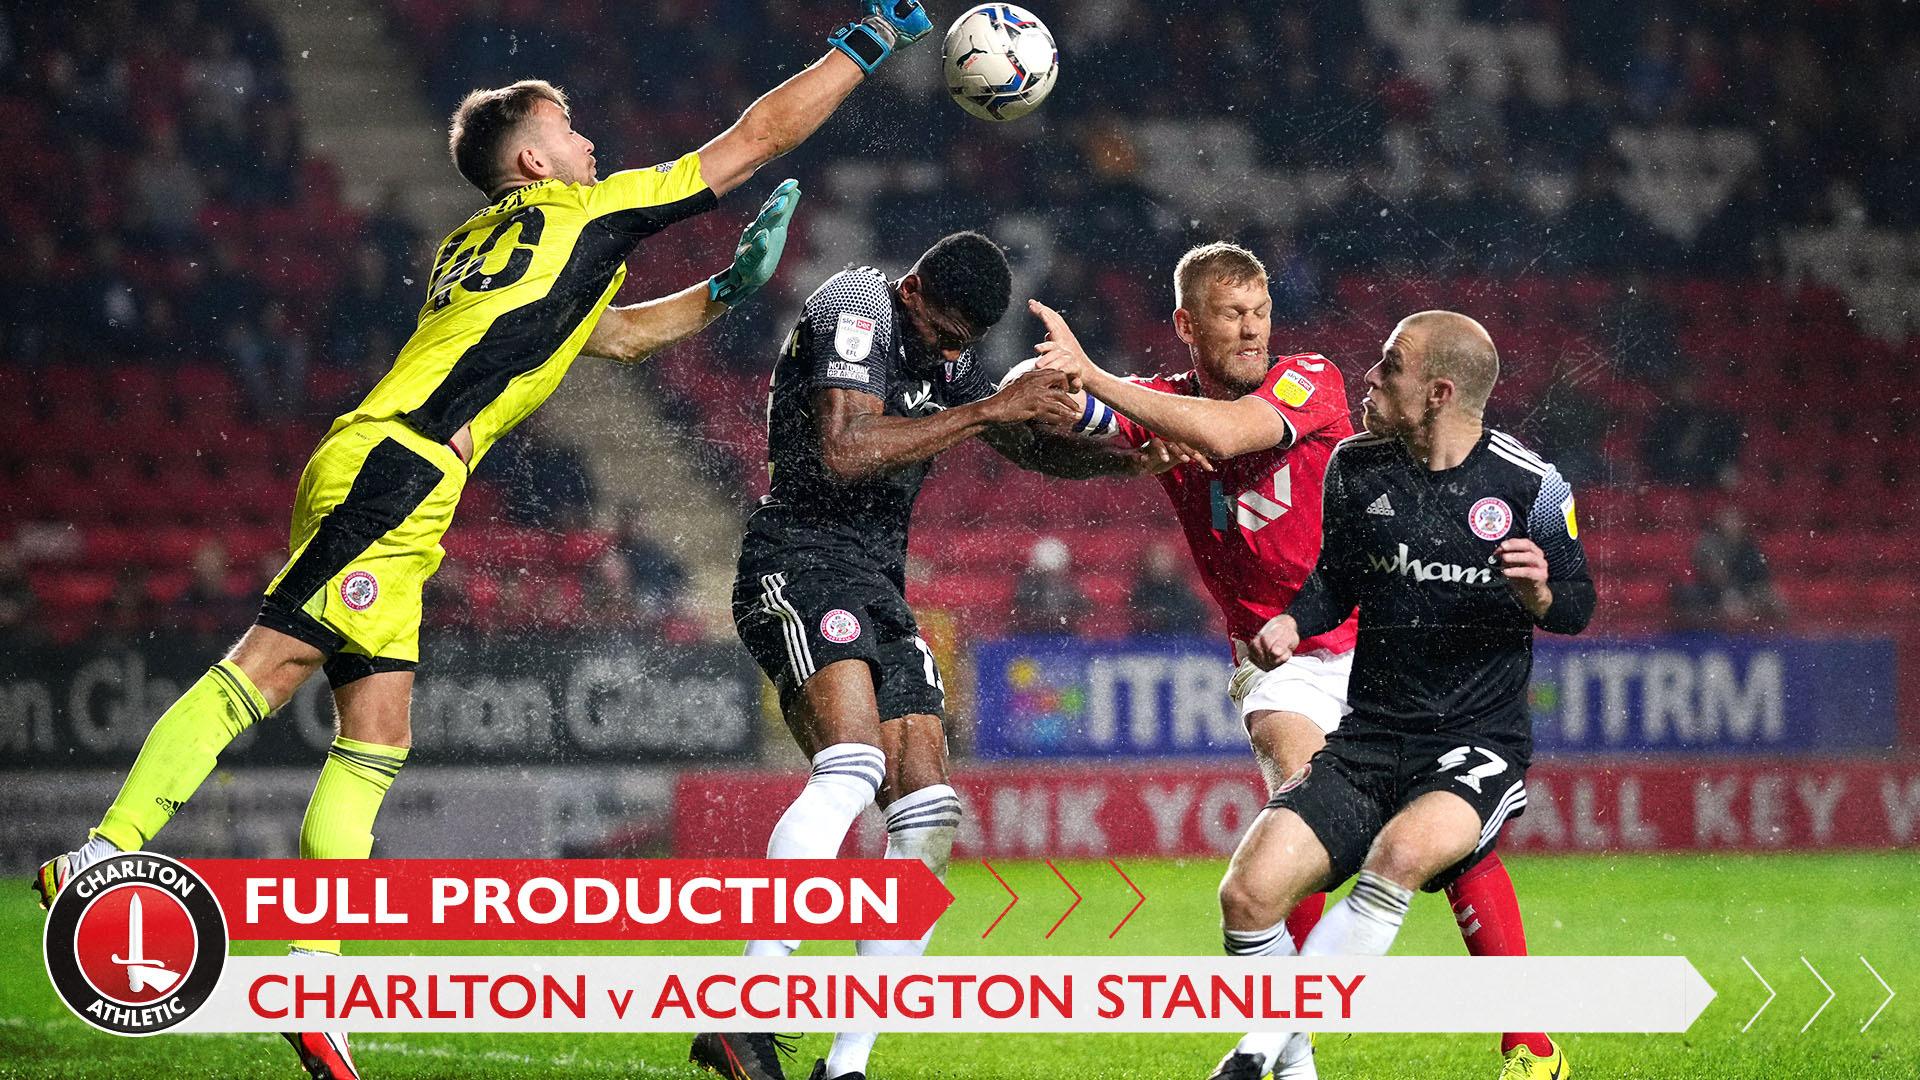 CharltonTV   Full broadcast - Accrington Stanley (October 2021)